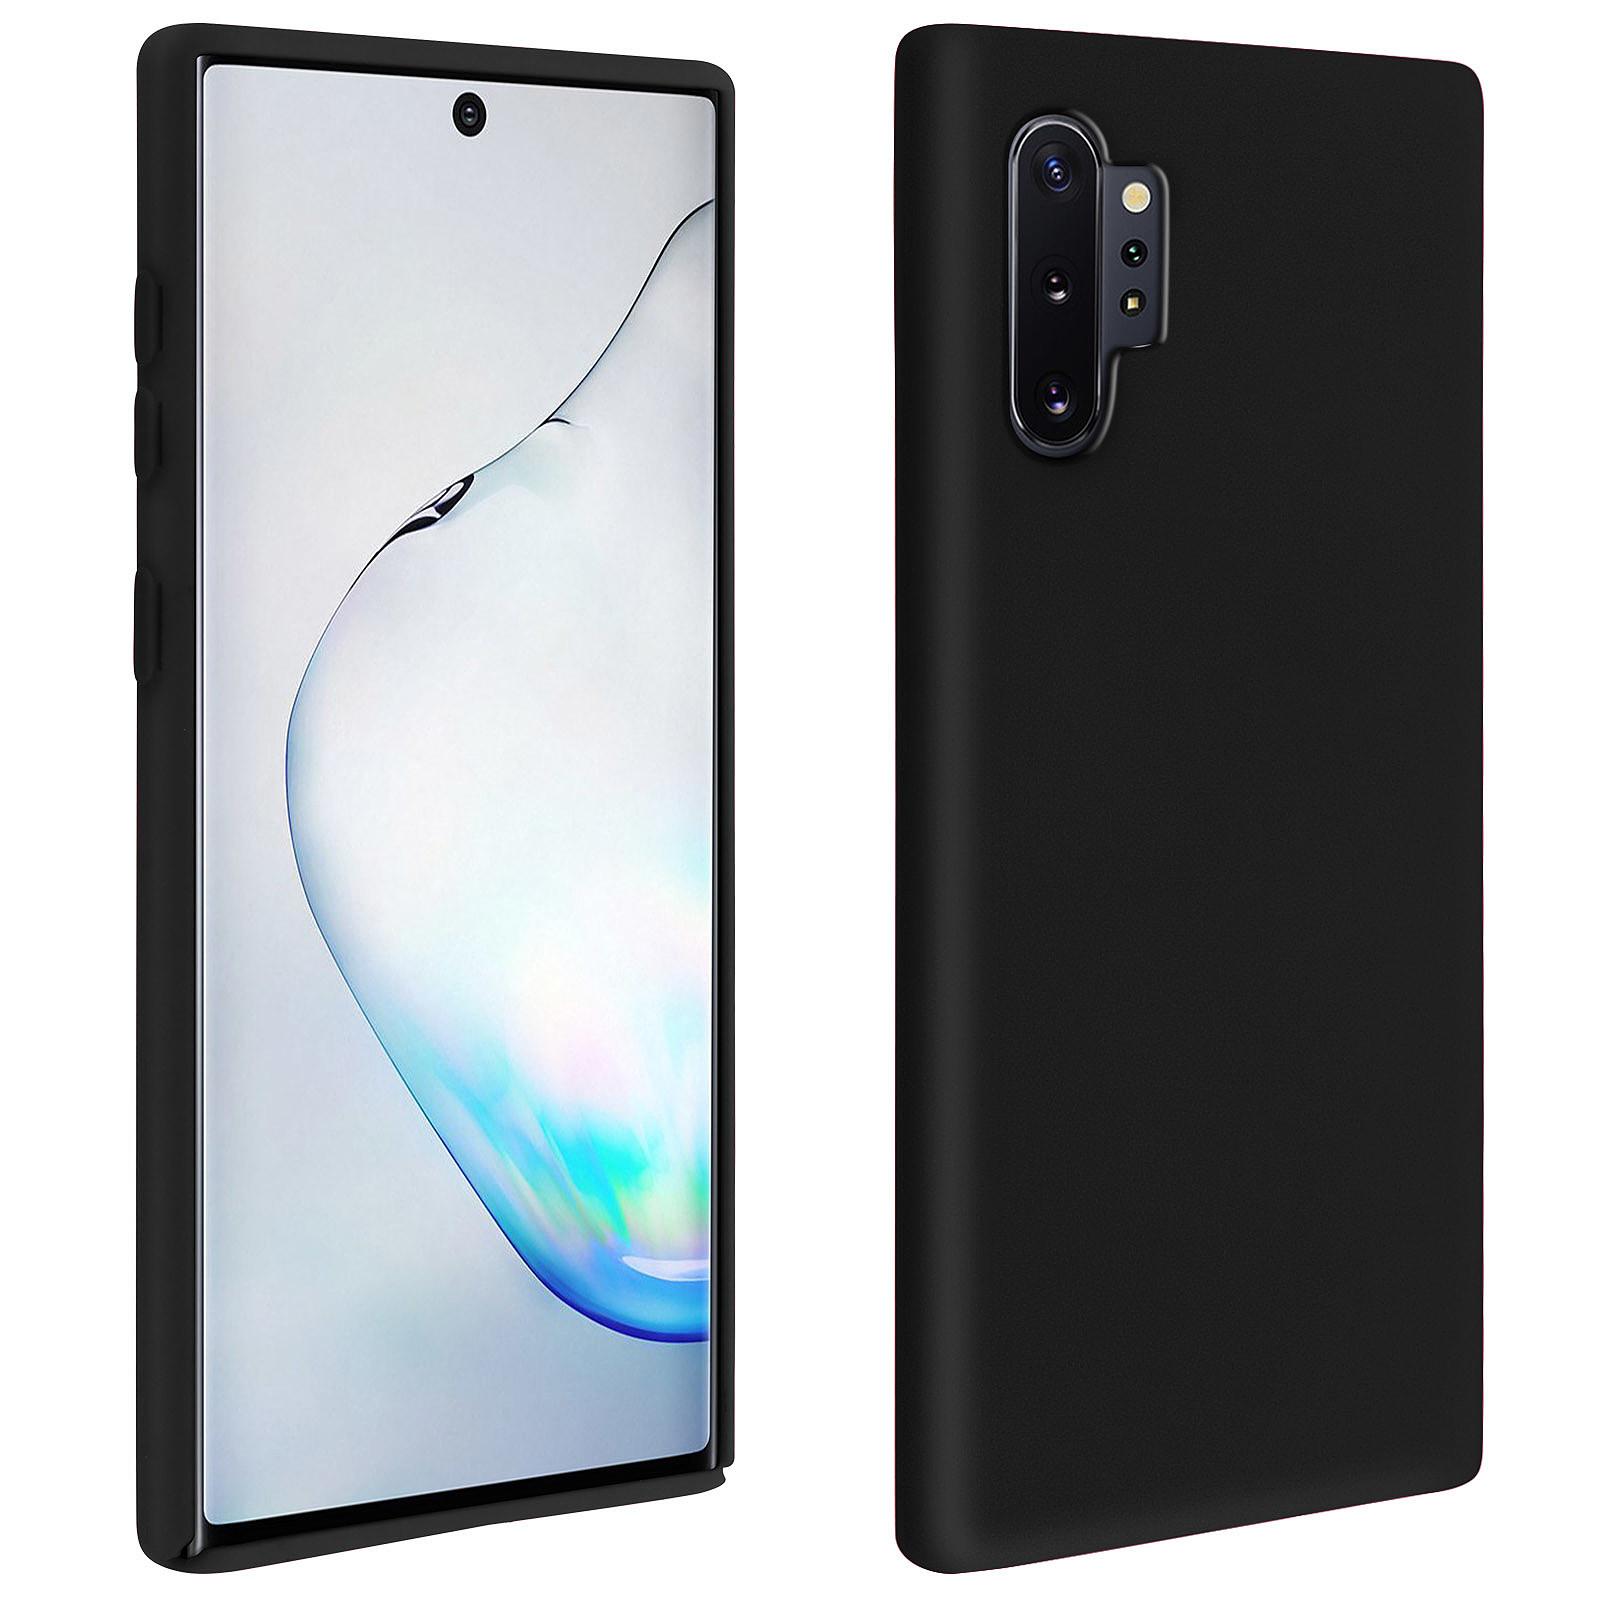 Avizar Coque Noir pour Samsung Galaxy Note 10 Plus